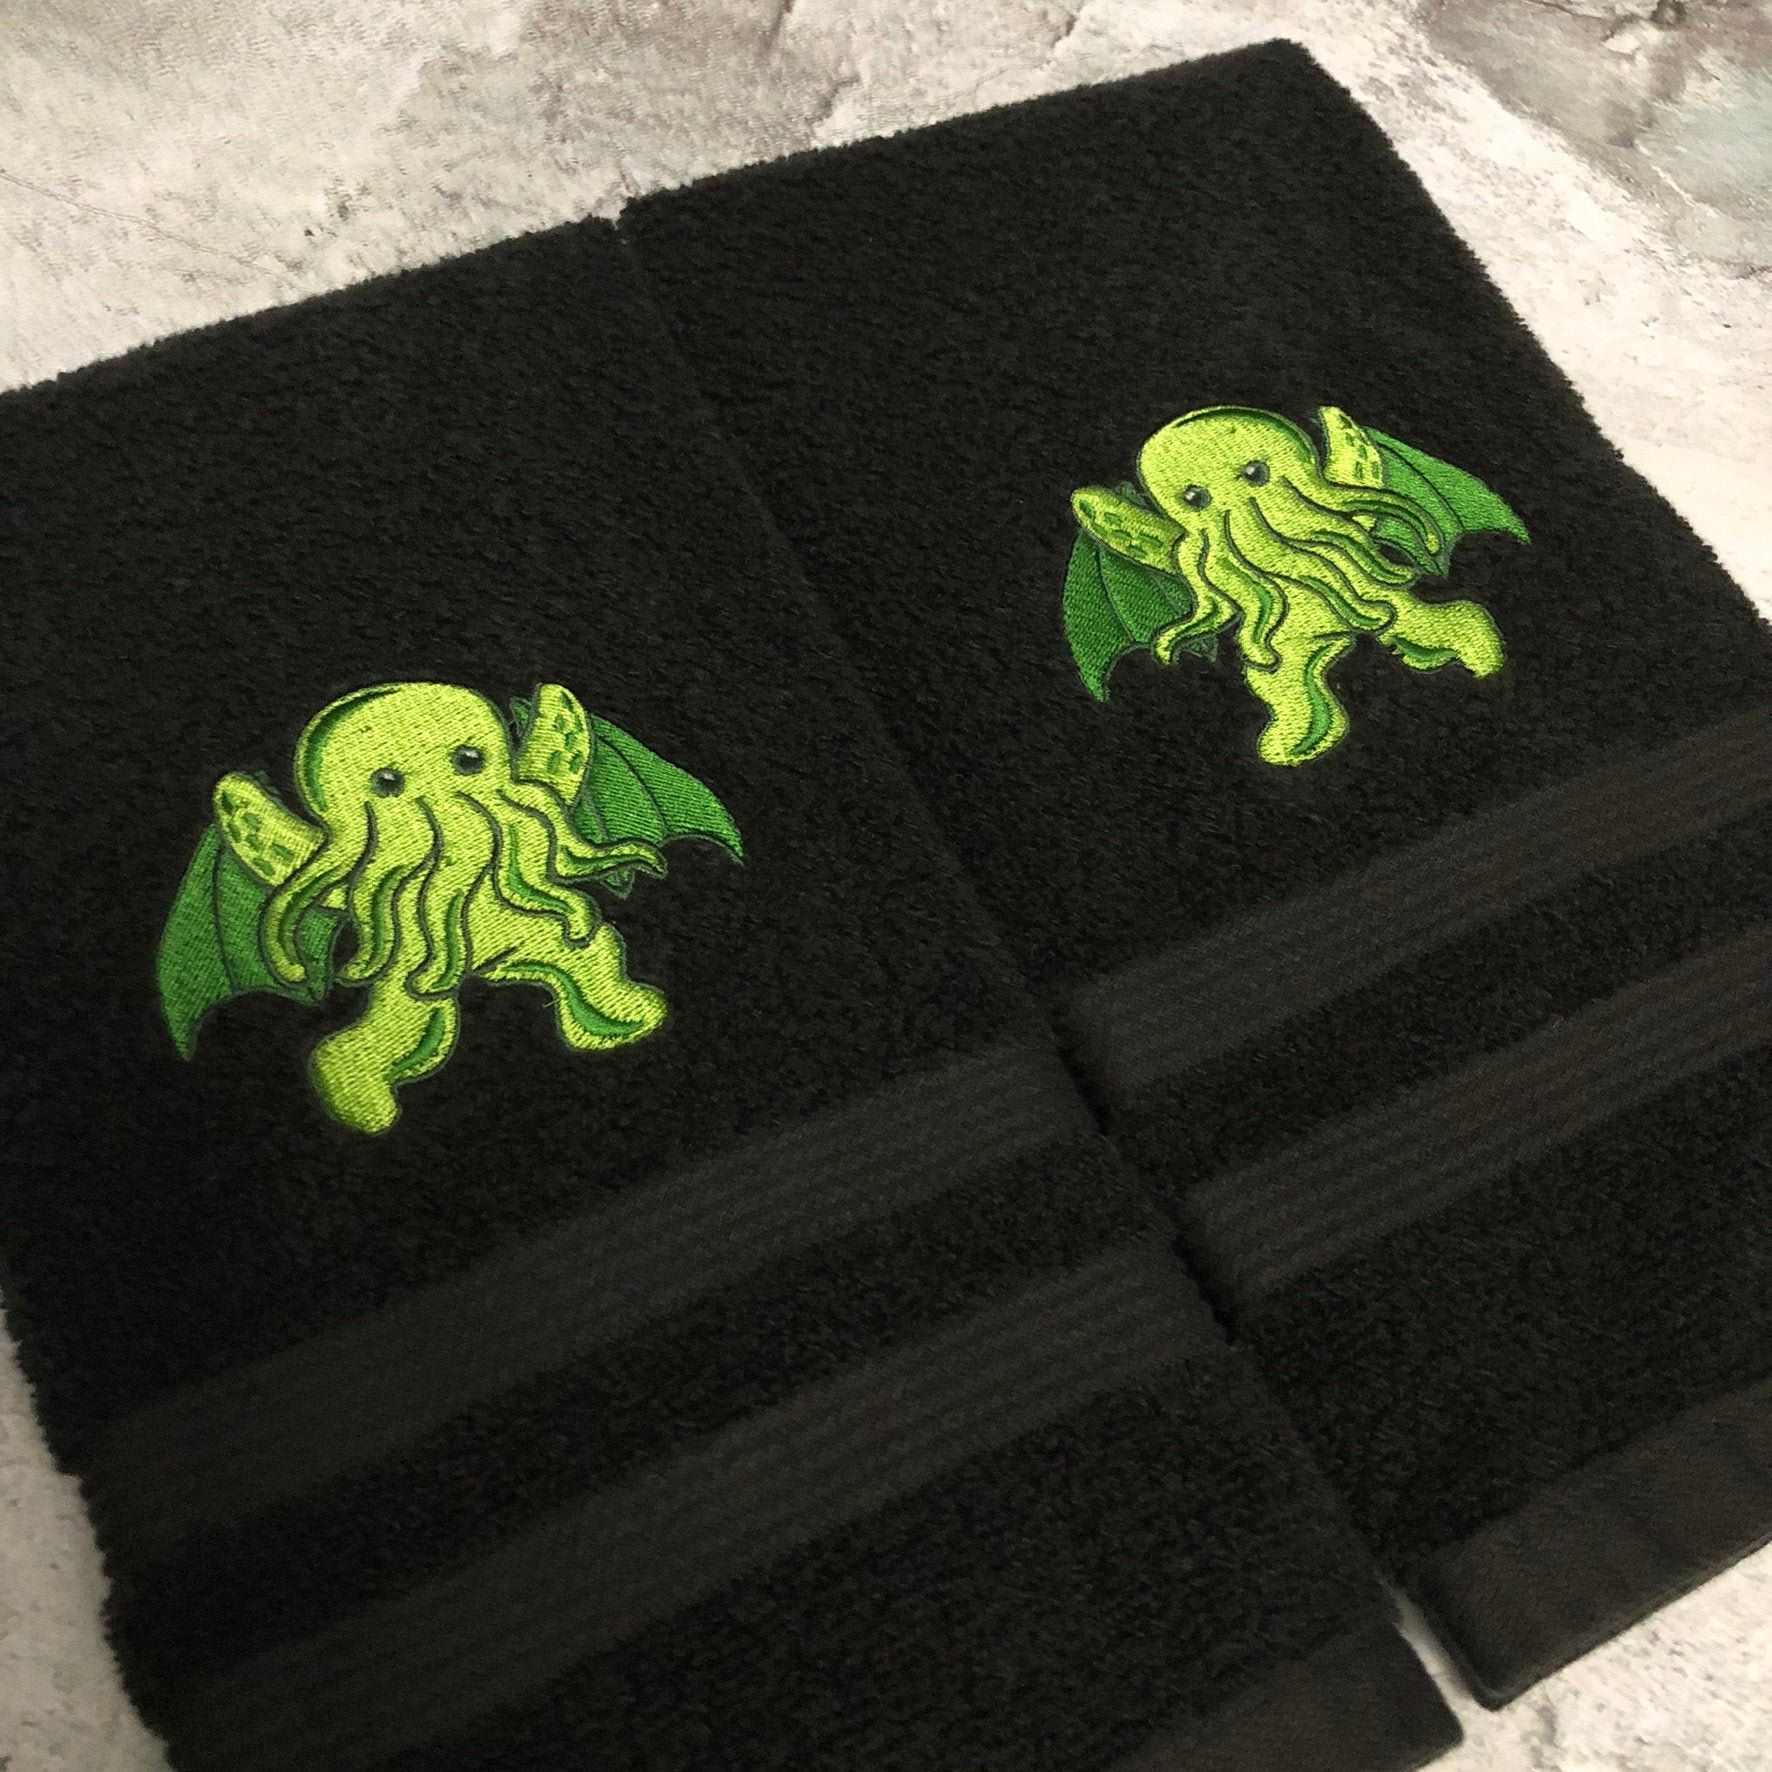 Photo of Cthulhu Hand Towel Set, gothic decor, Halloween decor, Lovecraft, sea monster, horror decor, creatures, mythical, Halloween